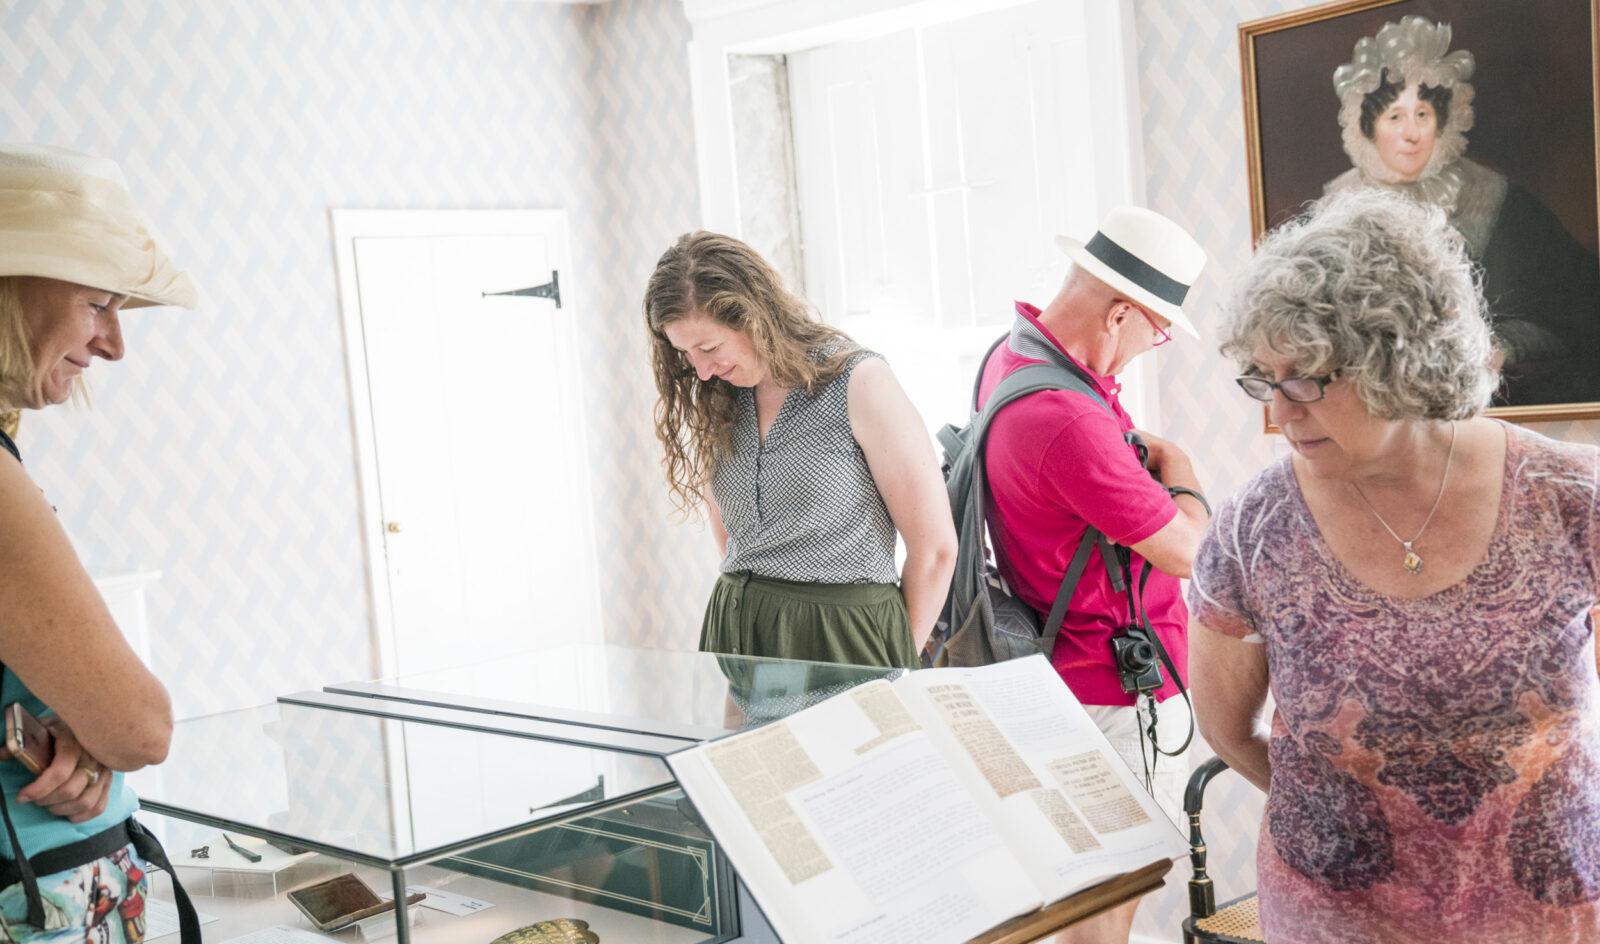 Visitors at Jane Austen's House